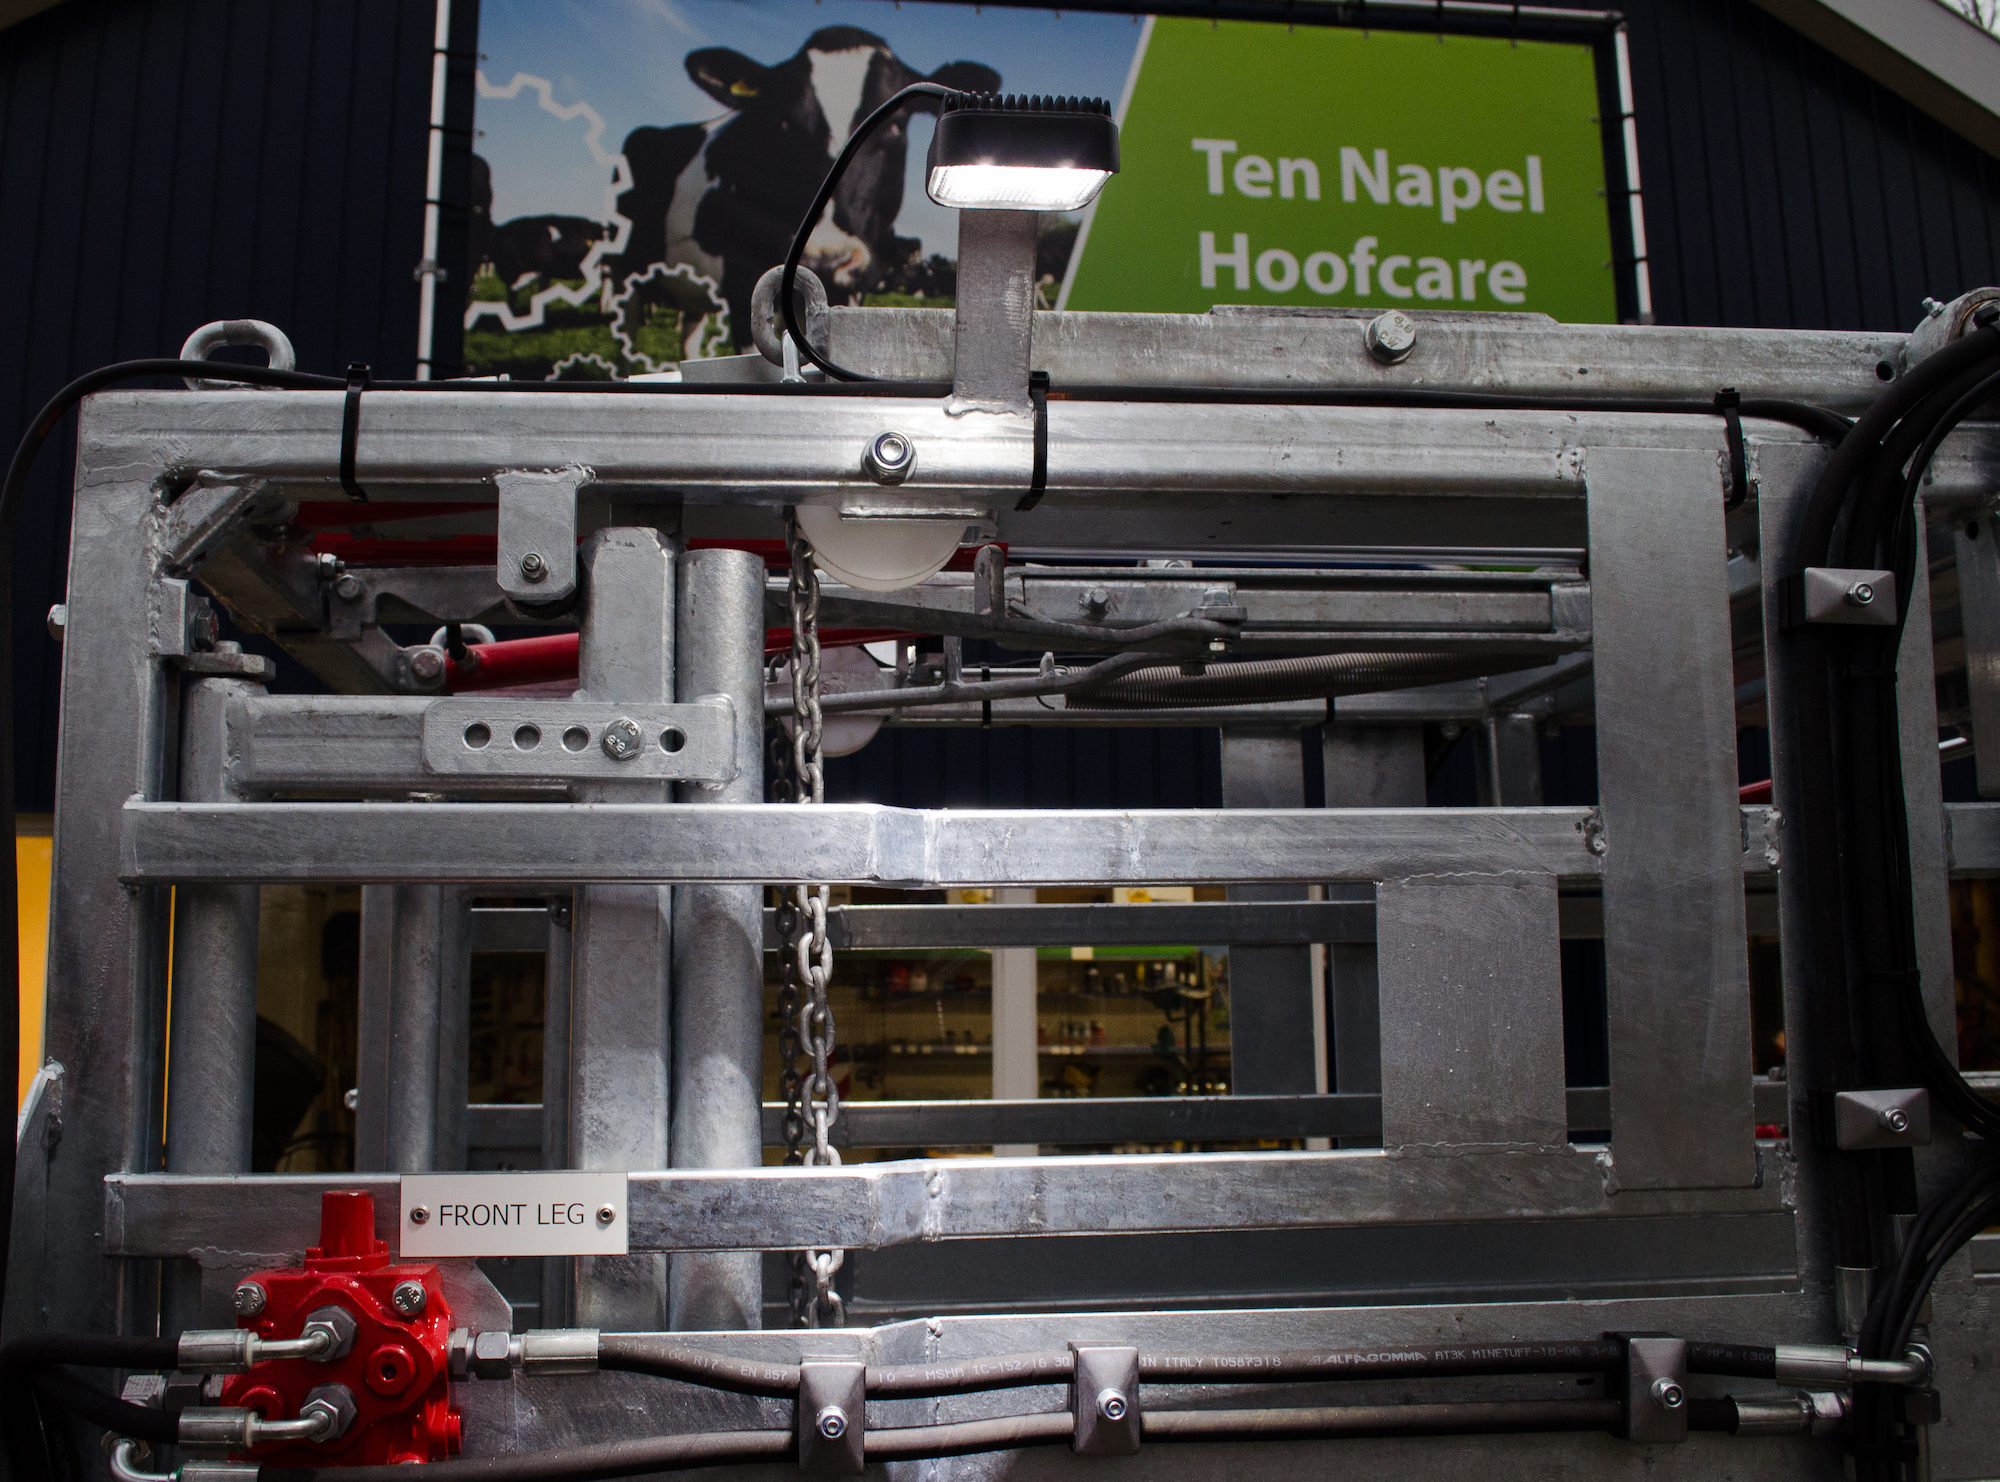 Ten Napel Hoofcare Farmer Pro Basis